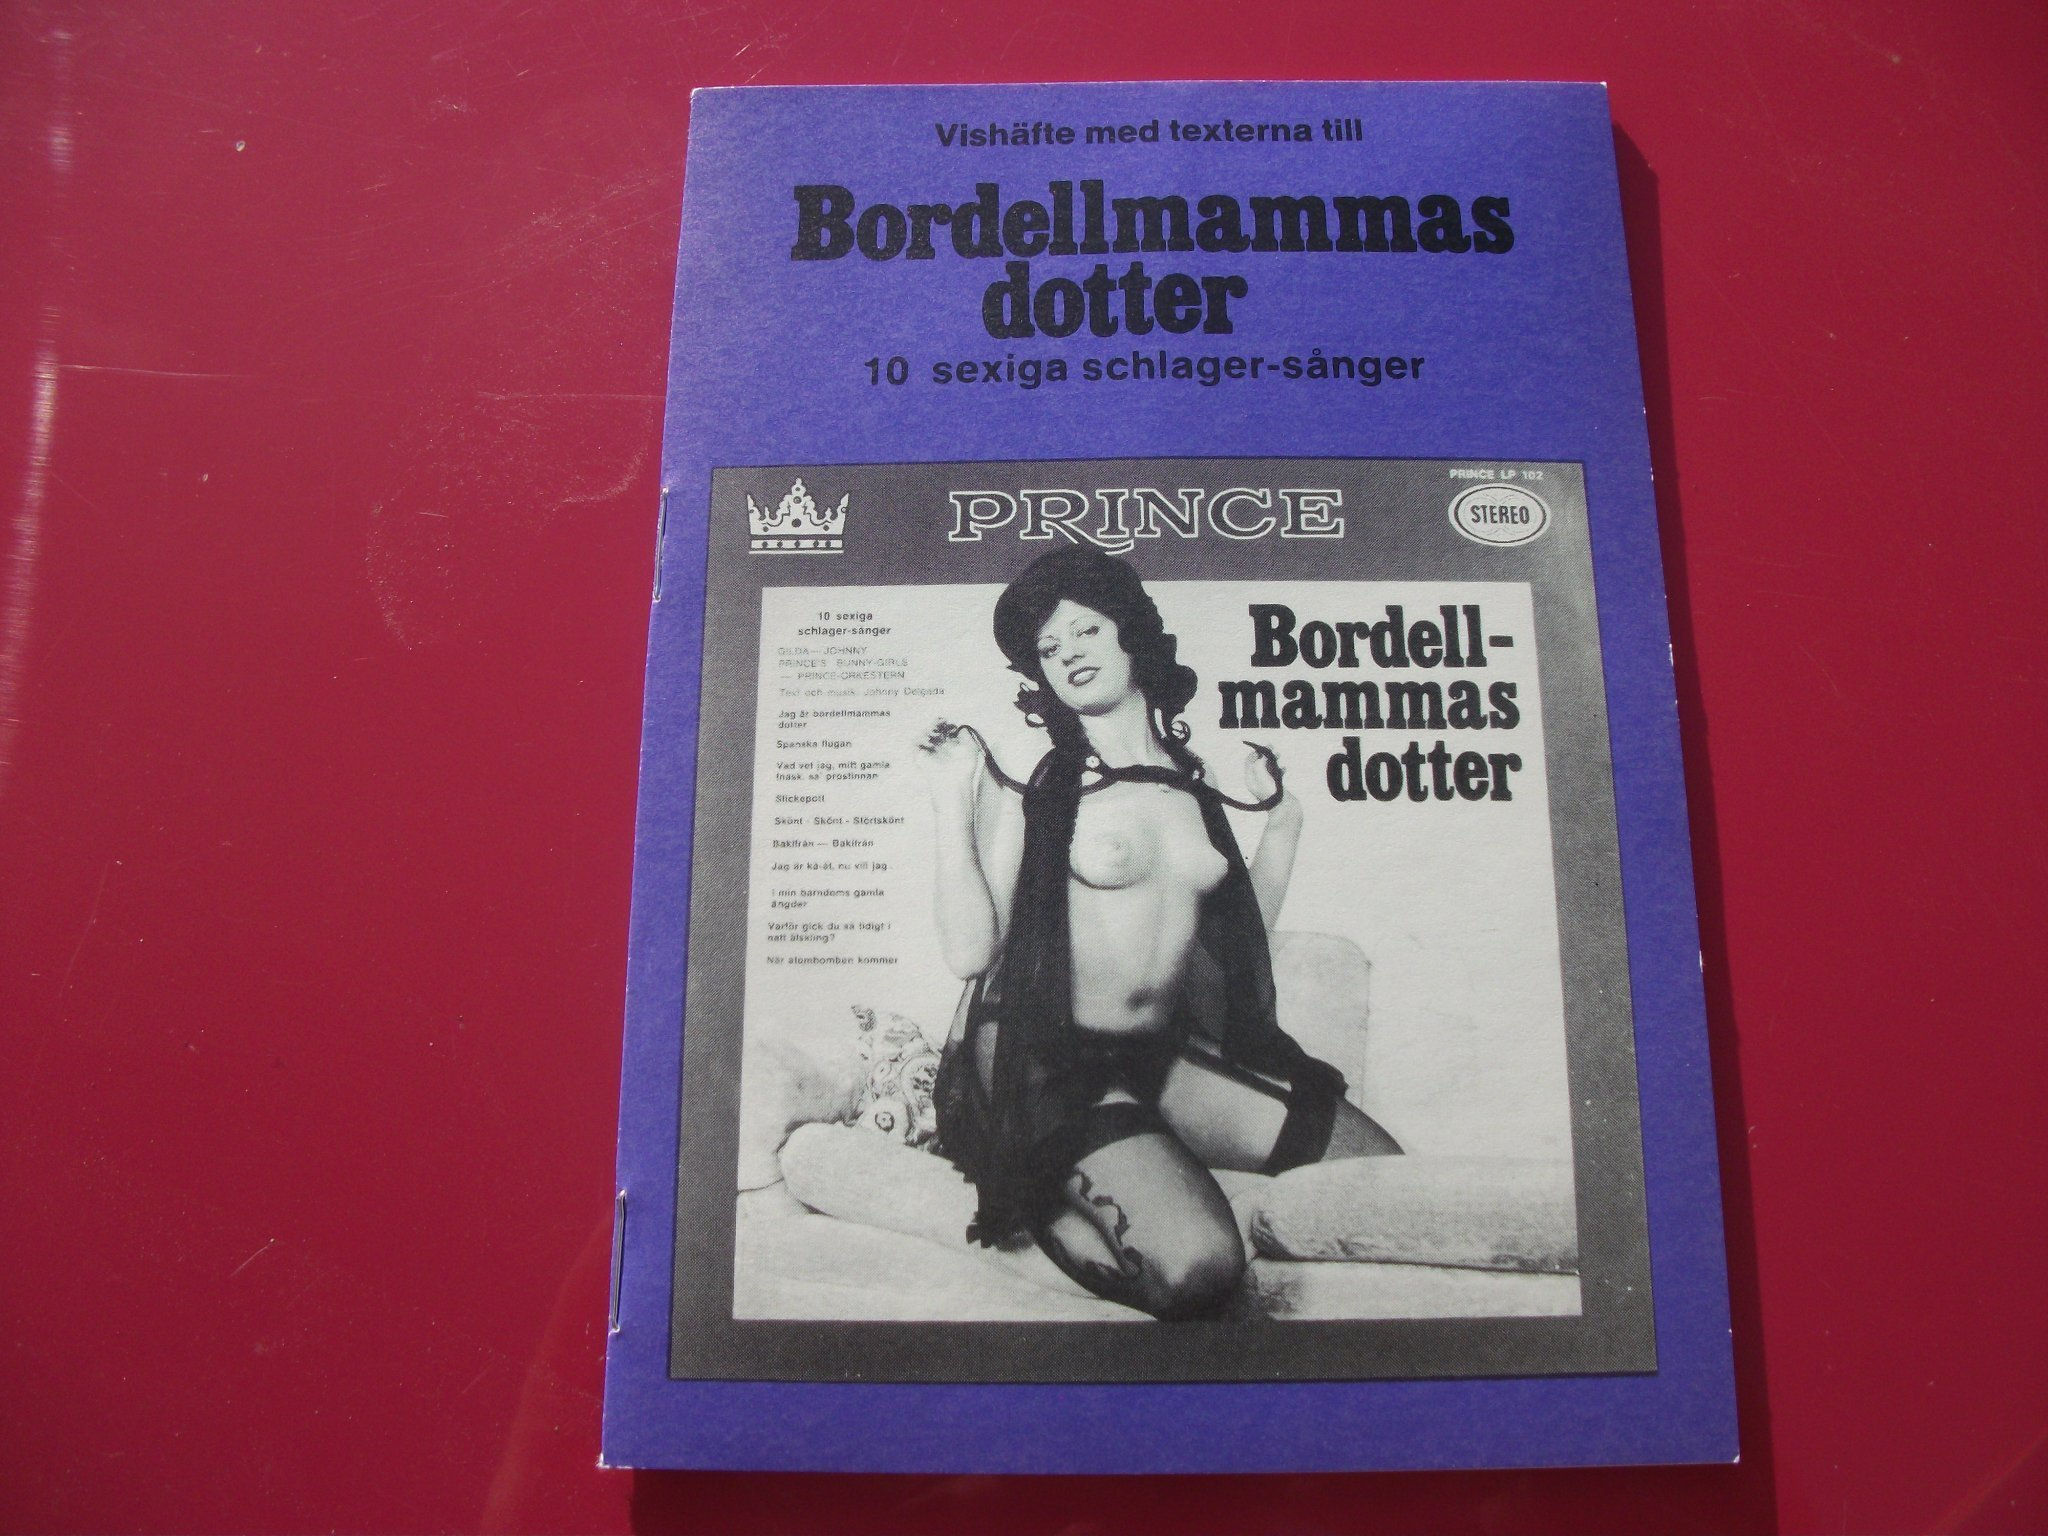 Bordellmammas Dotter